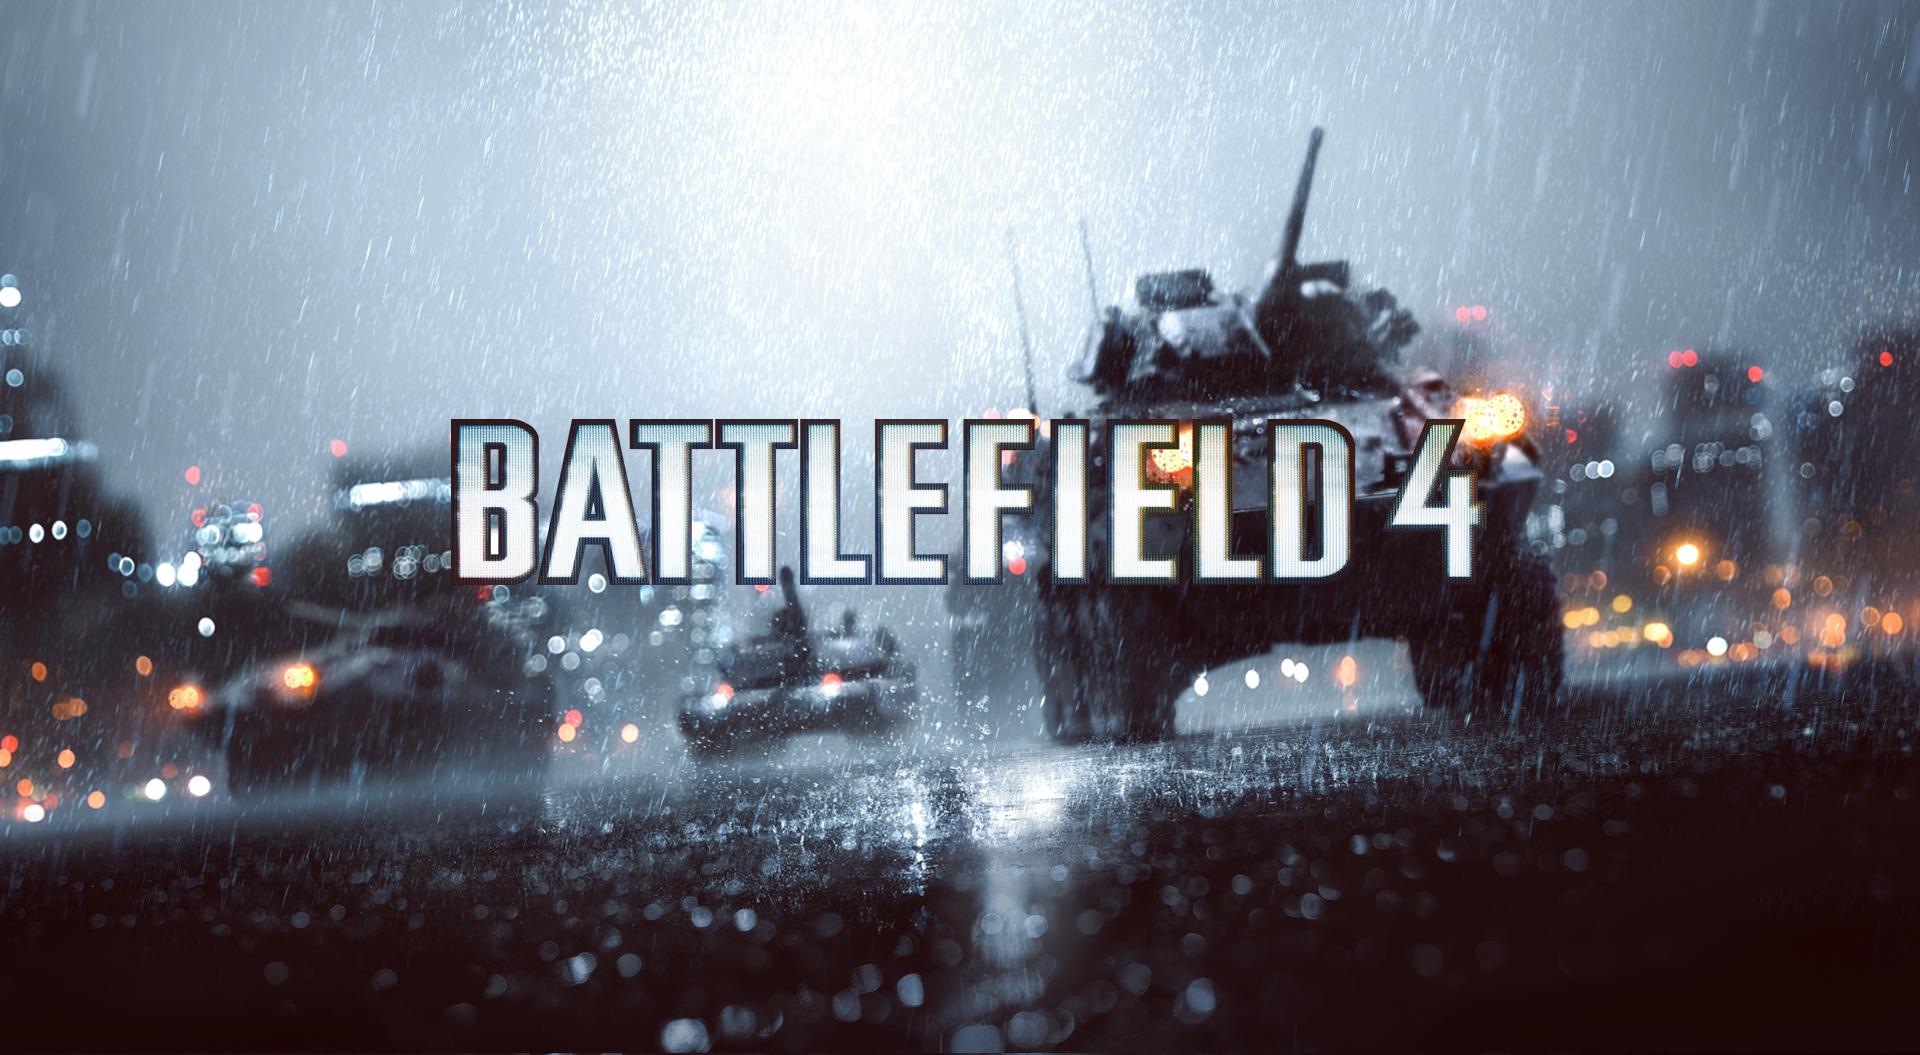 Battlefield 4 - Official Wallpaper V2 by MuuseDesign